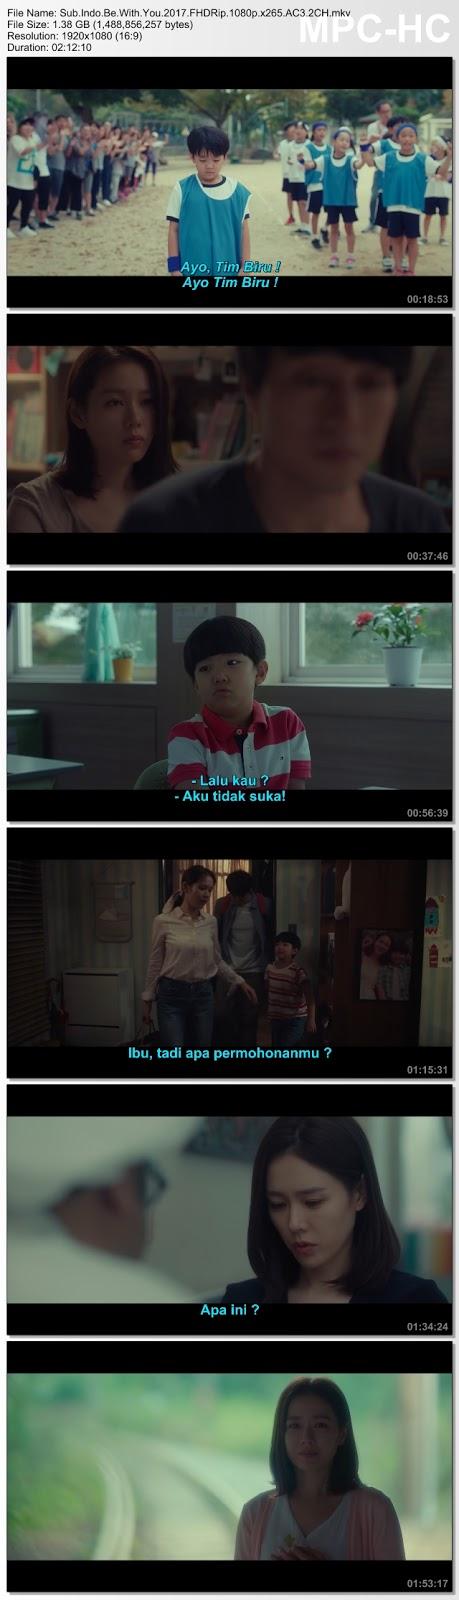 Screenshots Download Jigeum Mannareo Gamnida (2018) HDRip 480p & 3GP Subtitle Indonesia